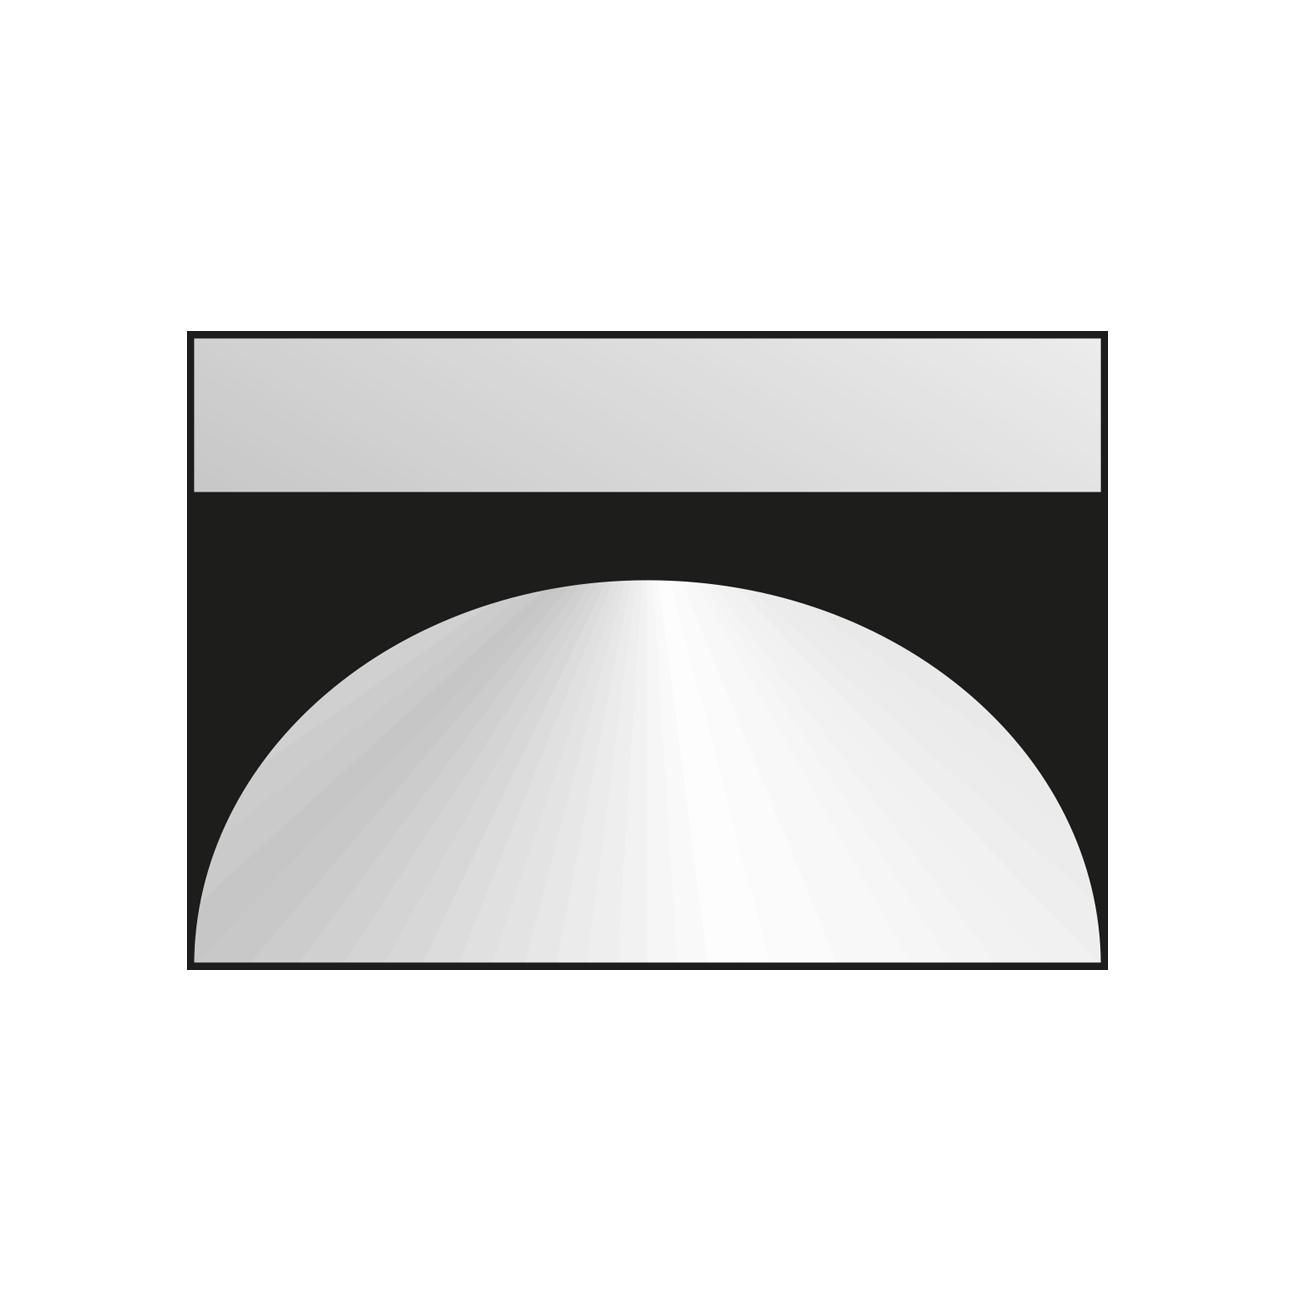 Pana Circulara 6888 Otel Olc45-5x 6.5-16